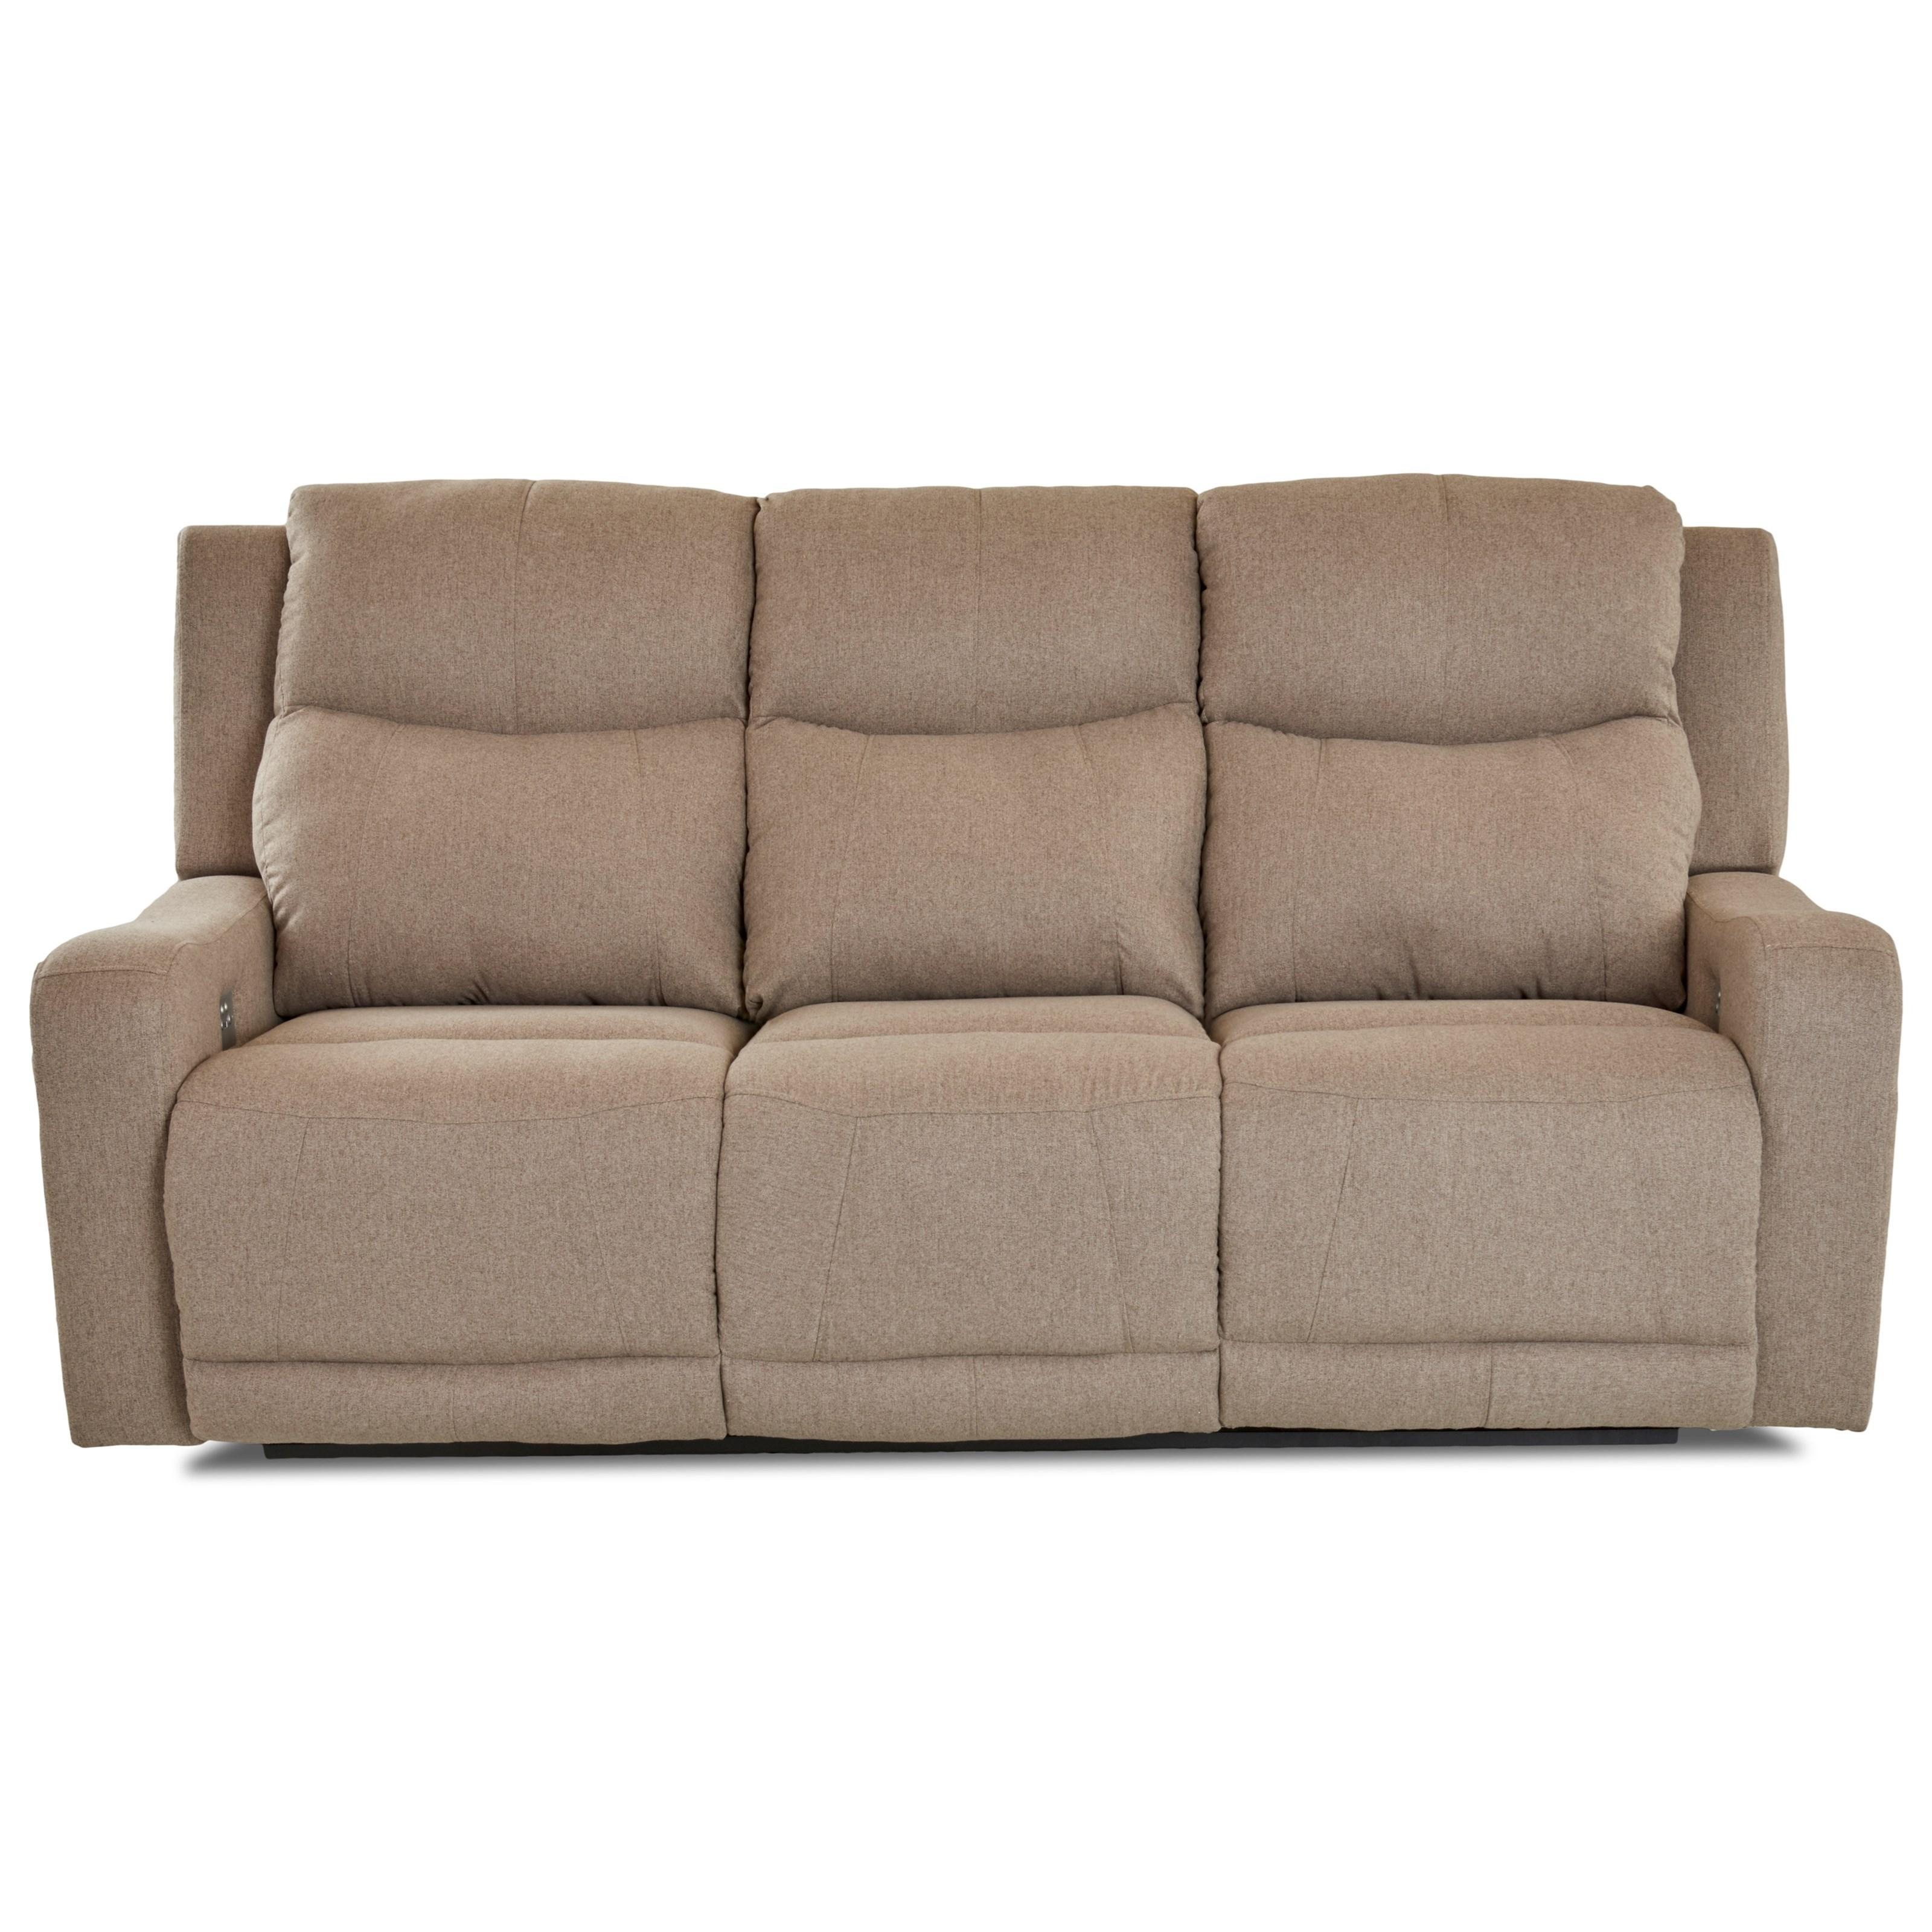 klaussner grand power reclining sofa sectional with chaise barnett headrest